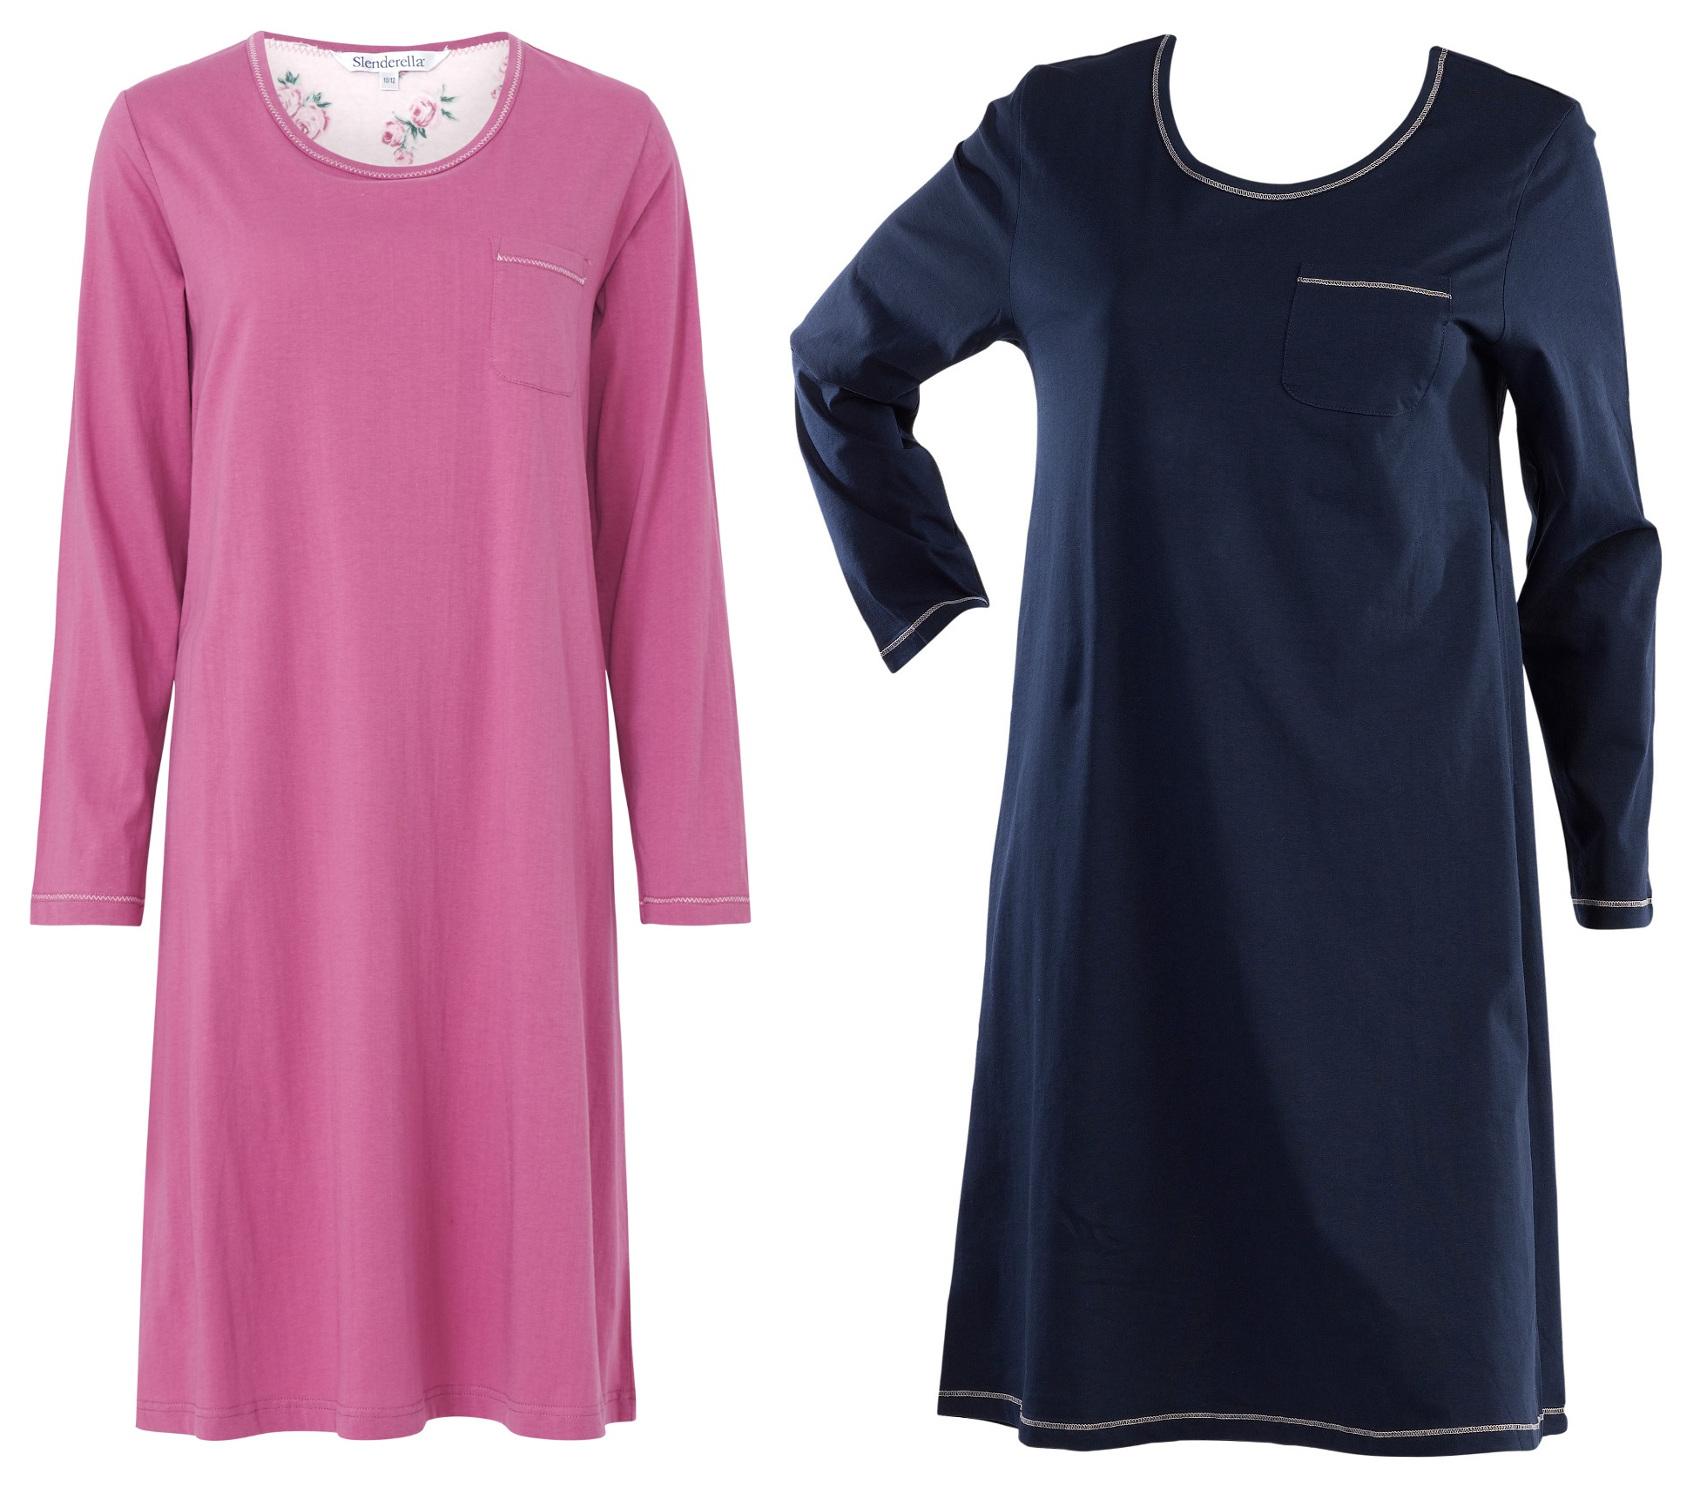 Ladies Slenderella 100% Cotton Jersey Nightdress Plain Long Sleeved Nightie f2821def5557